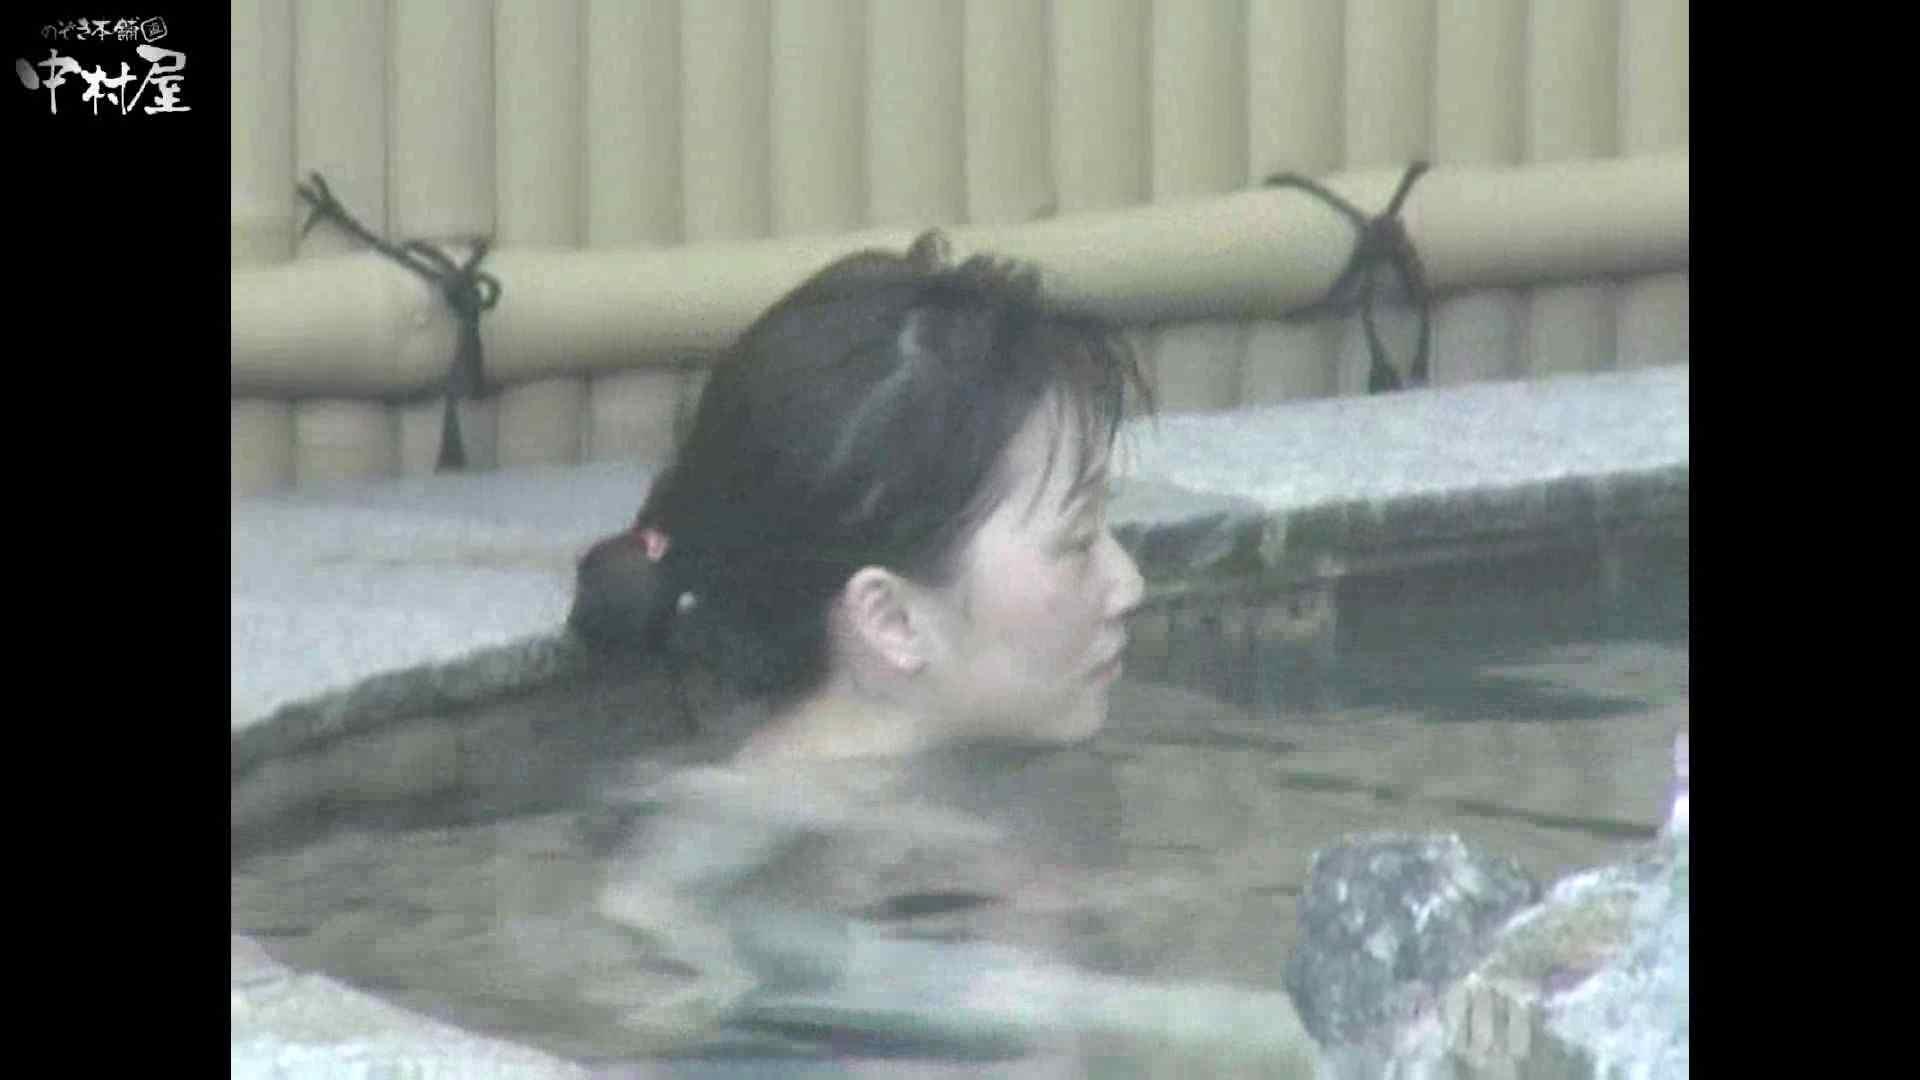 Aquaな露天風呂Vol.878潜入盗撮露天風呂十五判湯 其の一 露天 エロ画像 56連発 34